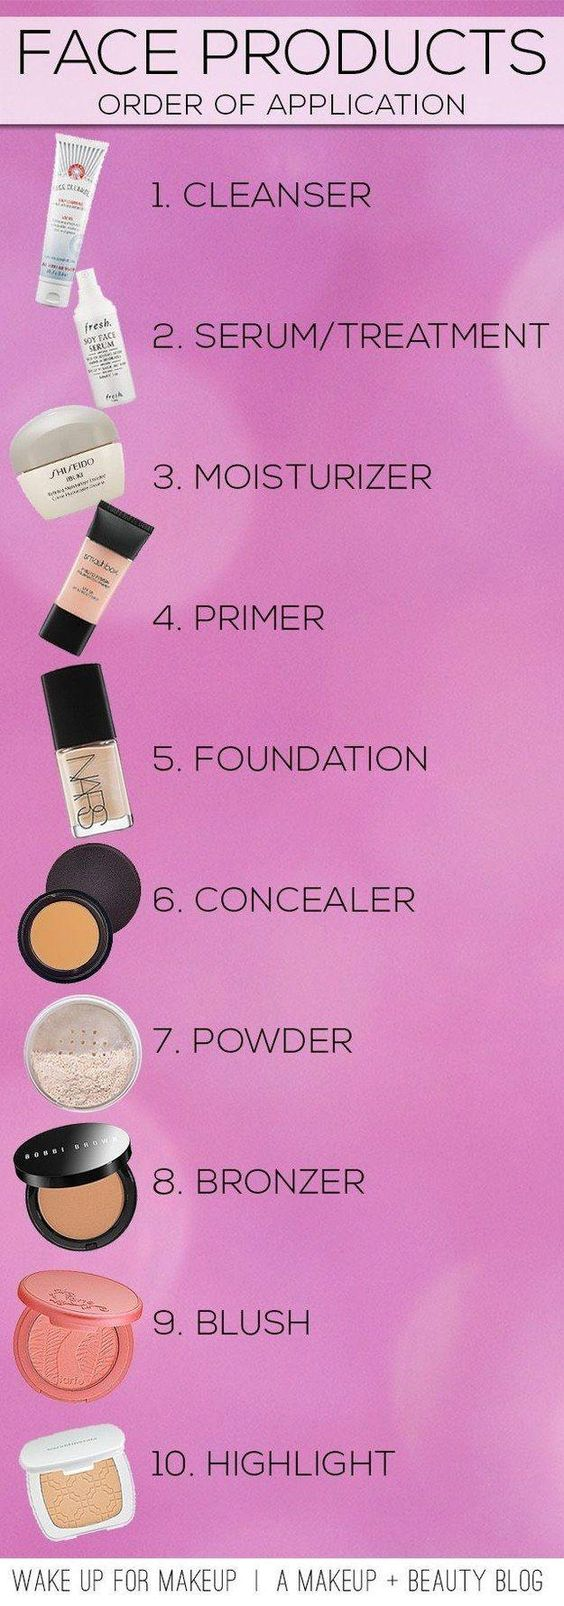 MODbeauty: Natural Glamorous Wedding Makeup tutorial - via Wake Up For Makeup